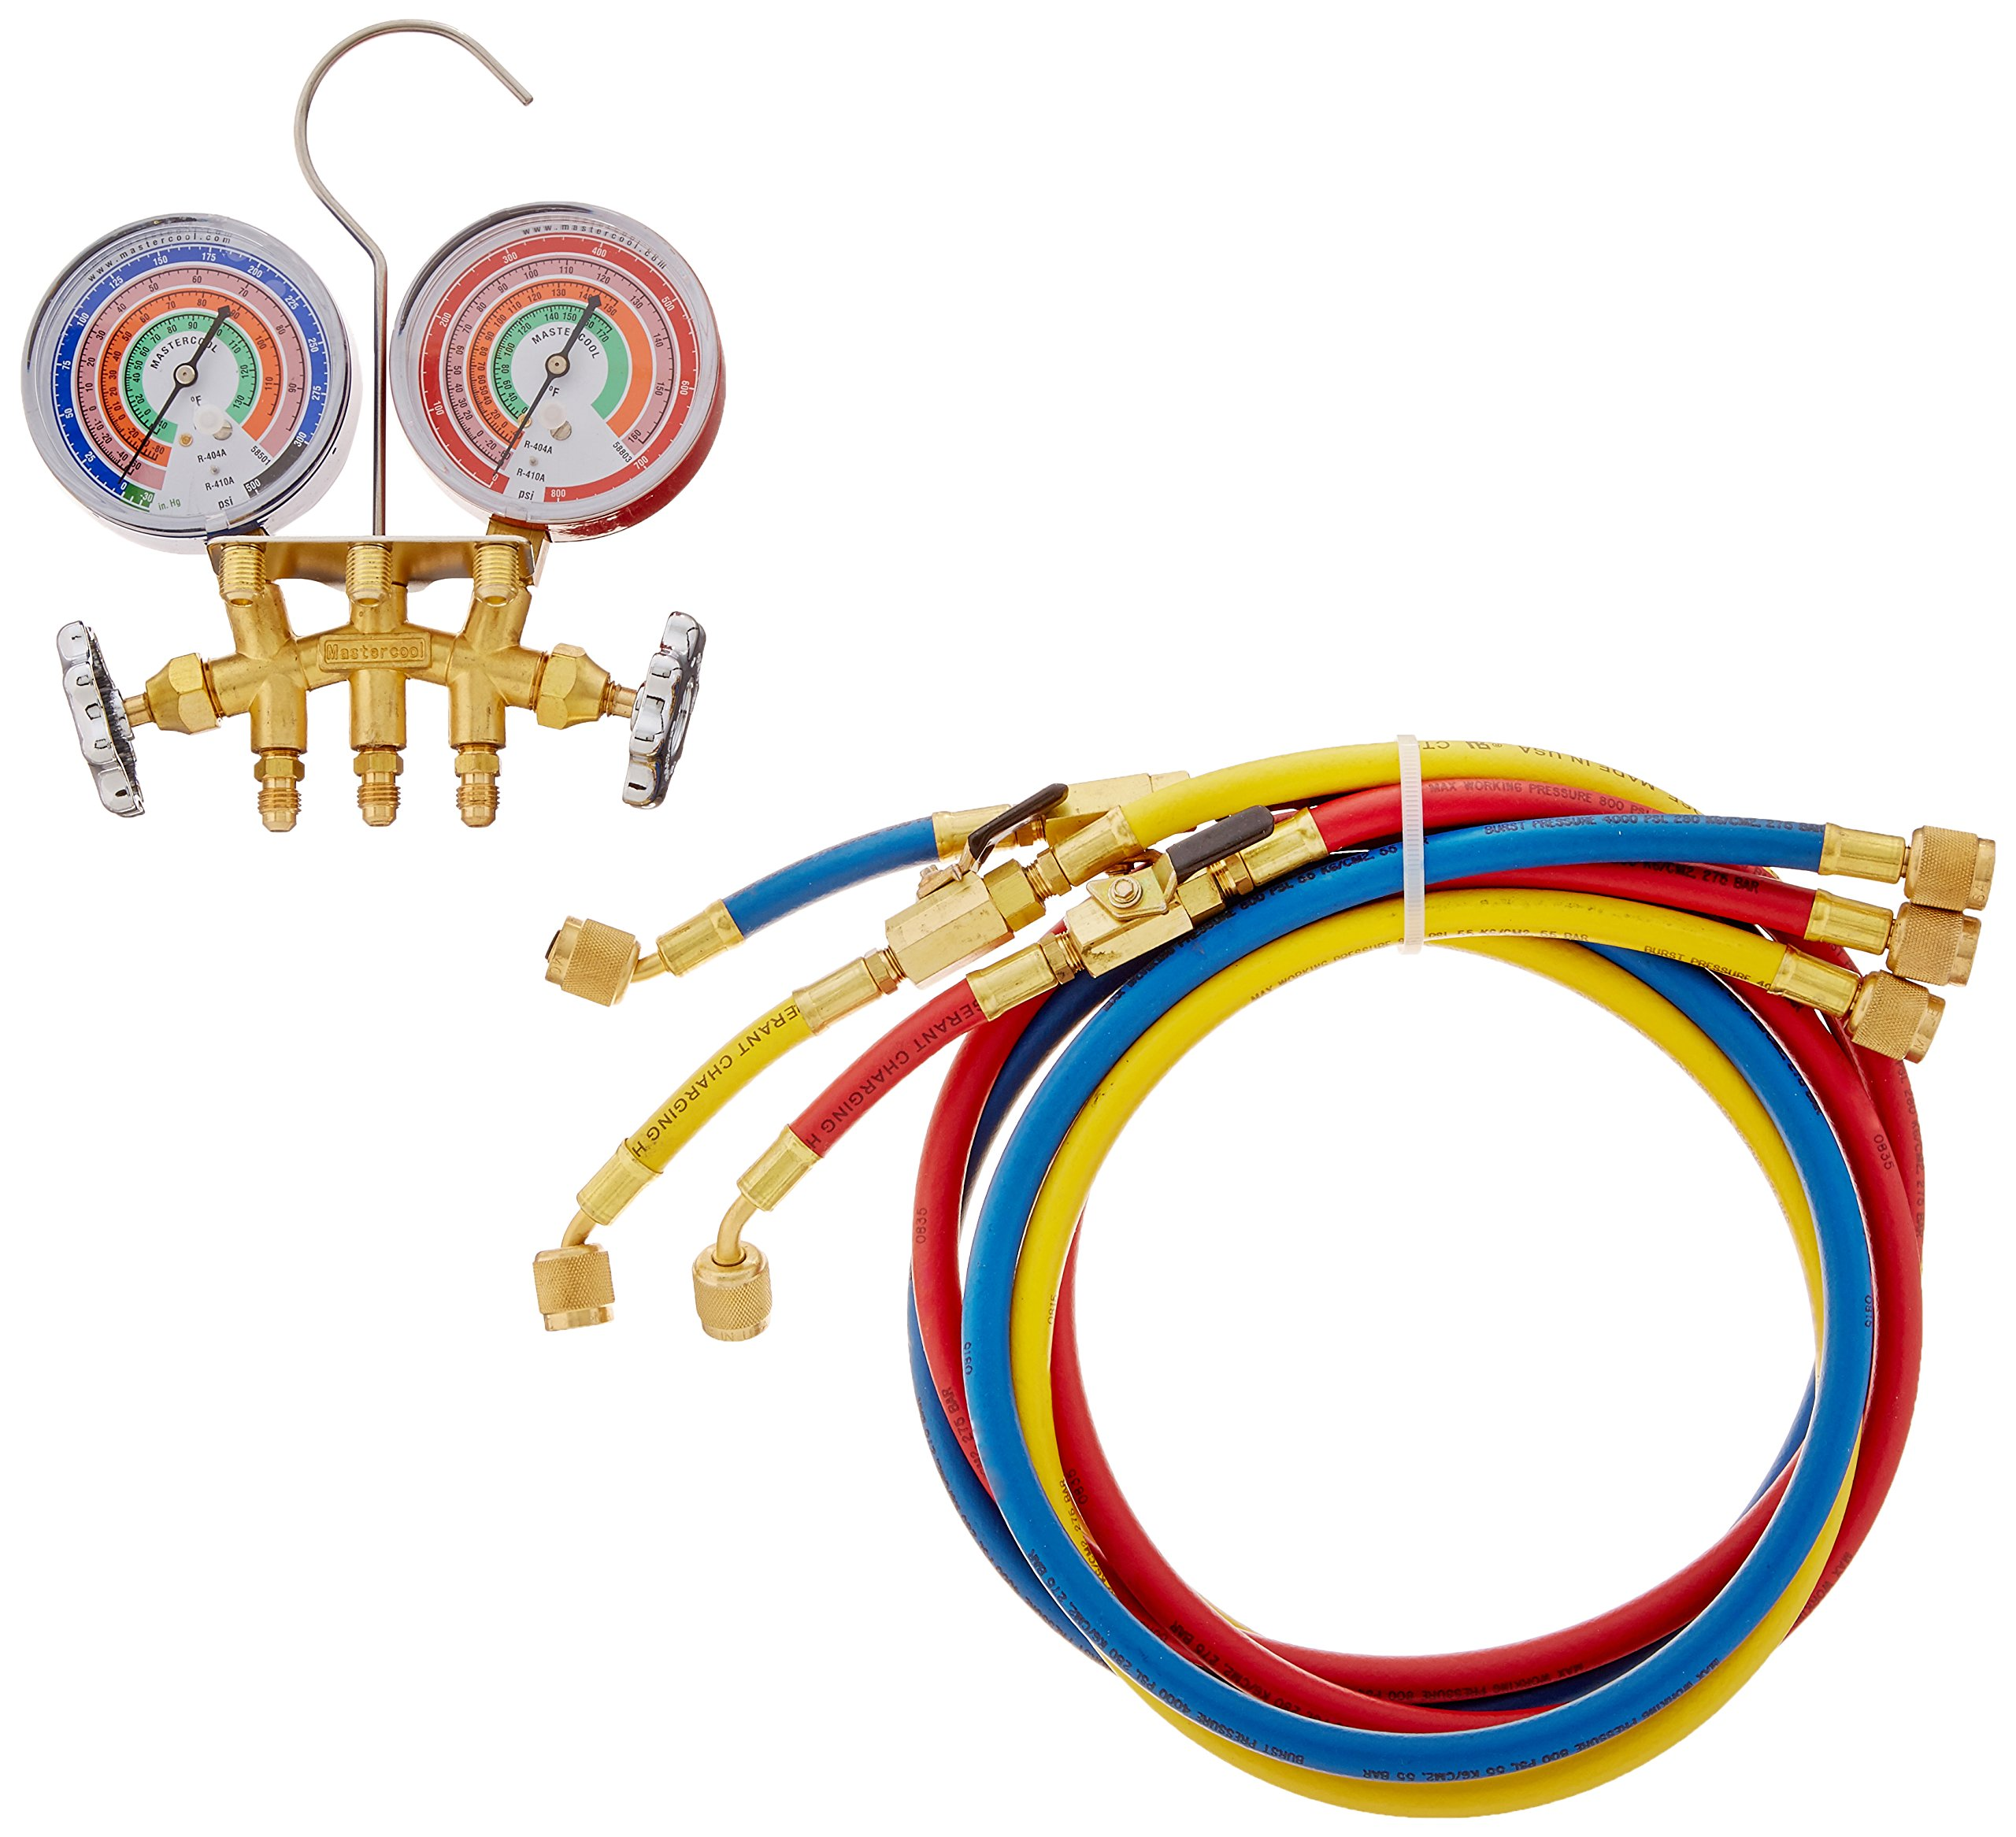 Rheem 59161 Rubber Manifold, Brass 2-Way, R, 22/R, 404A/R, 410A with Premium Hoses, 5 ' Length